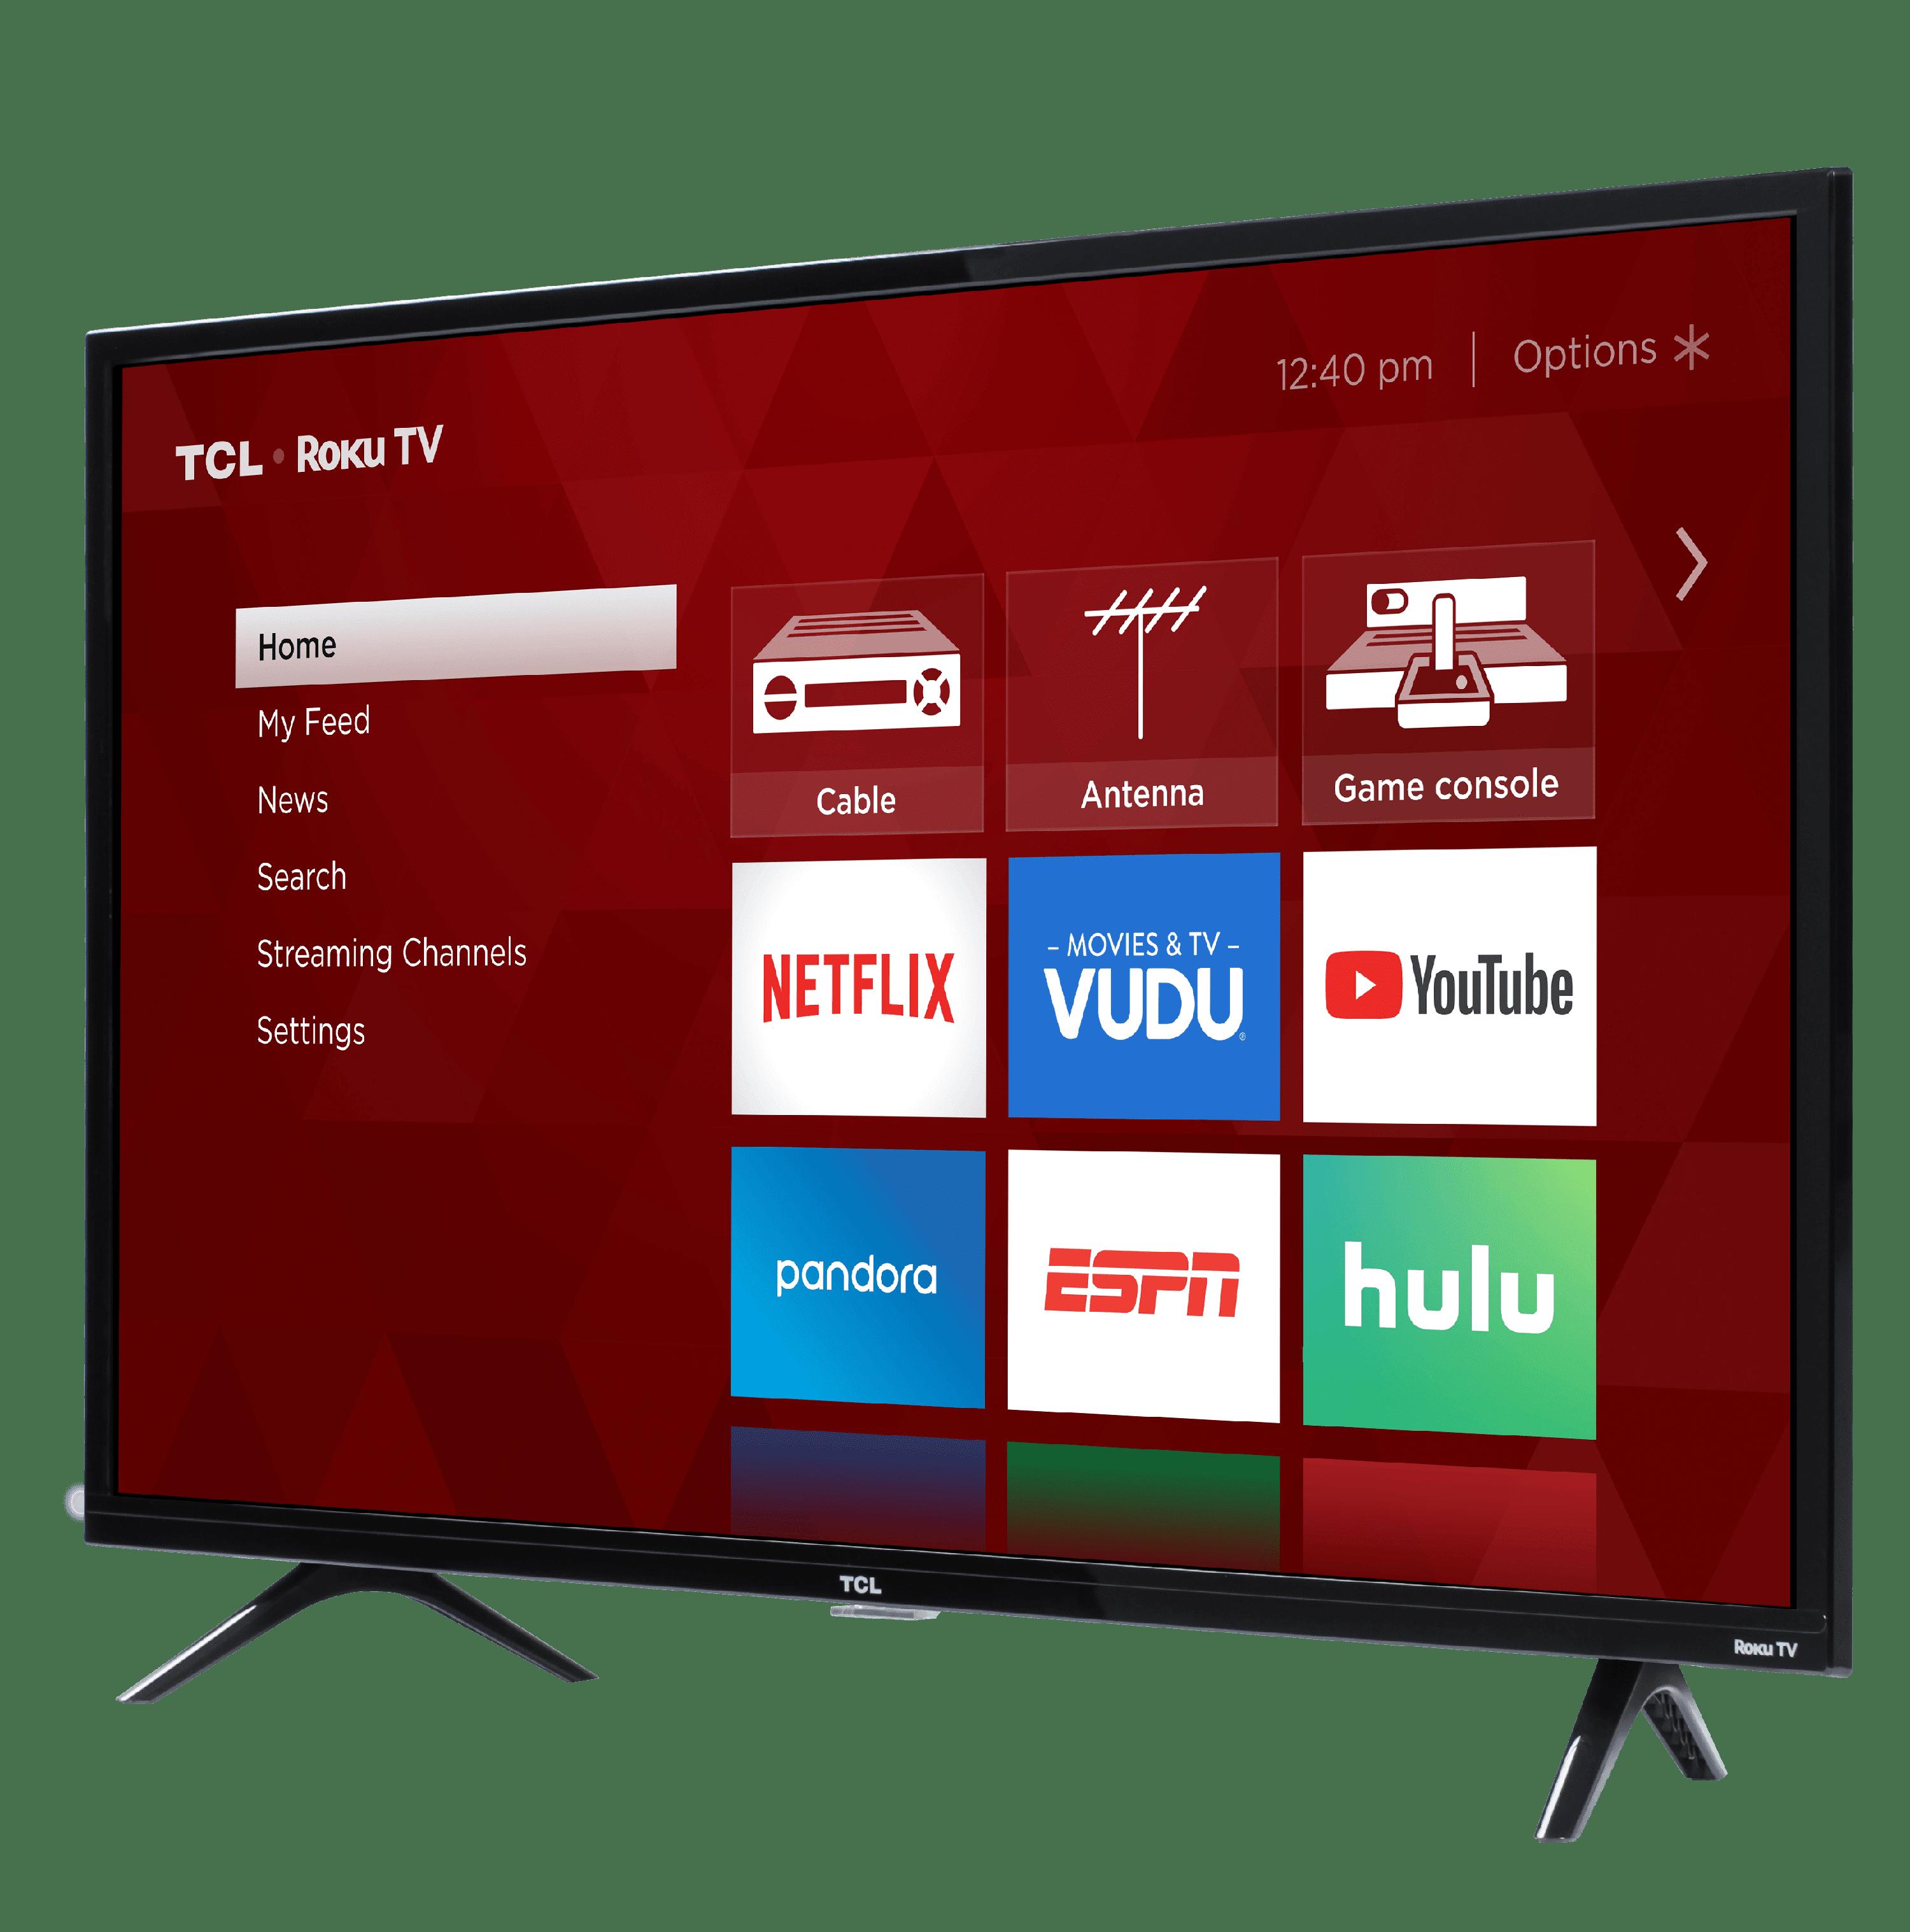 TCL 40 Class HD (1080P) Roku Smart LED TV (40S325) - Walmart com